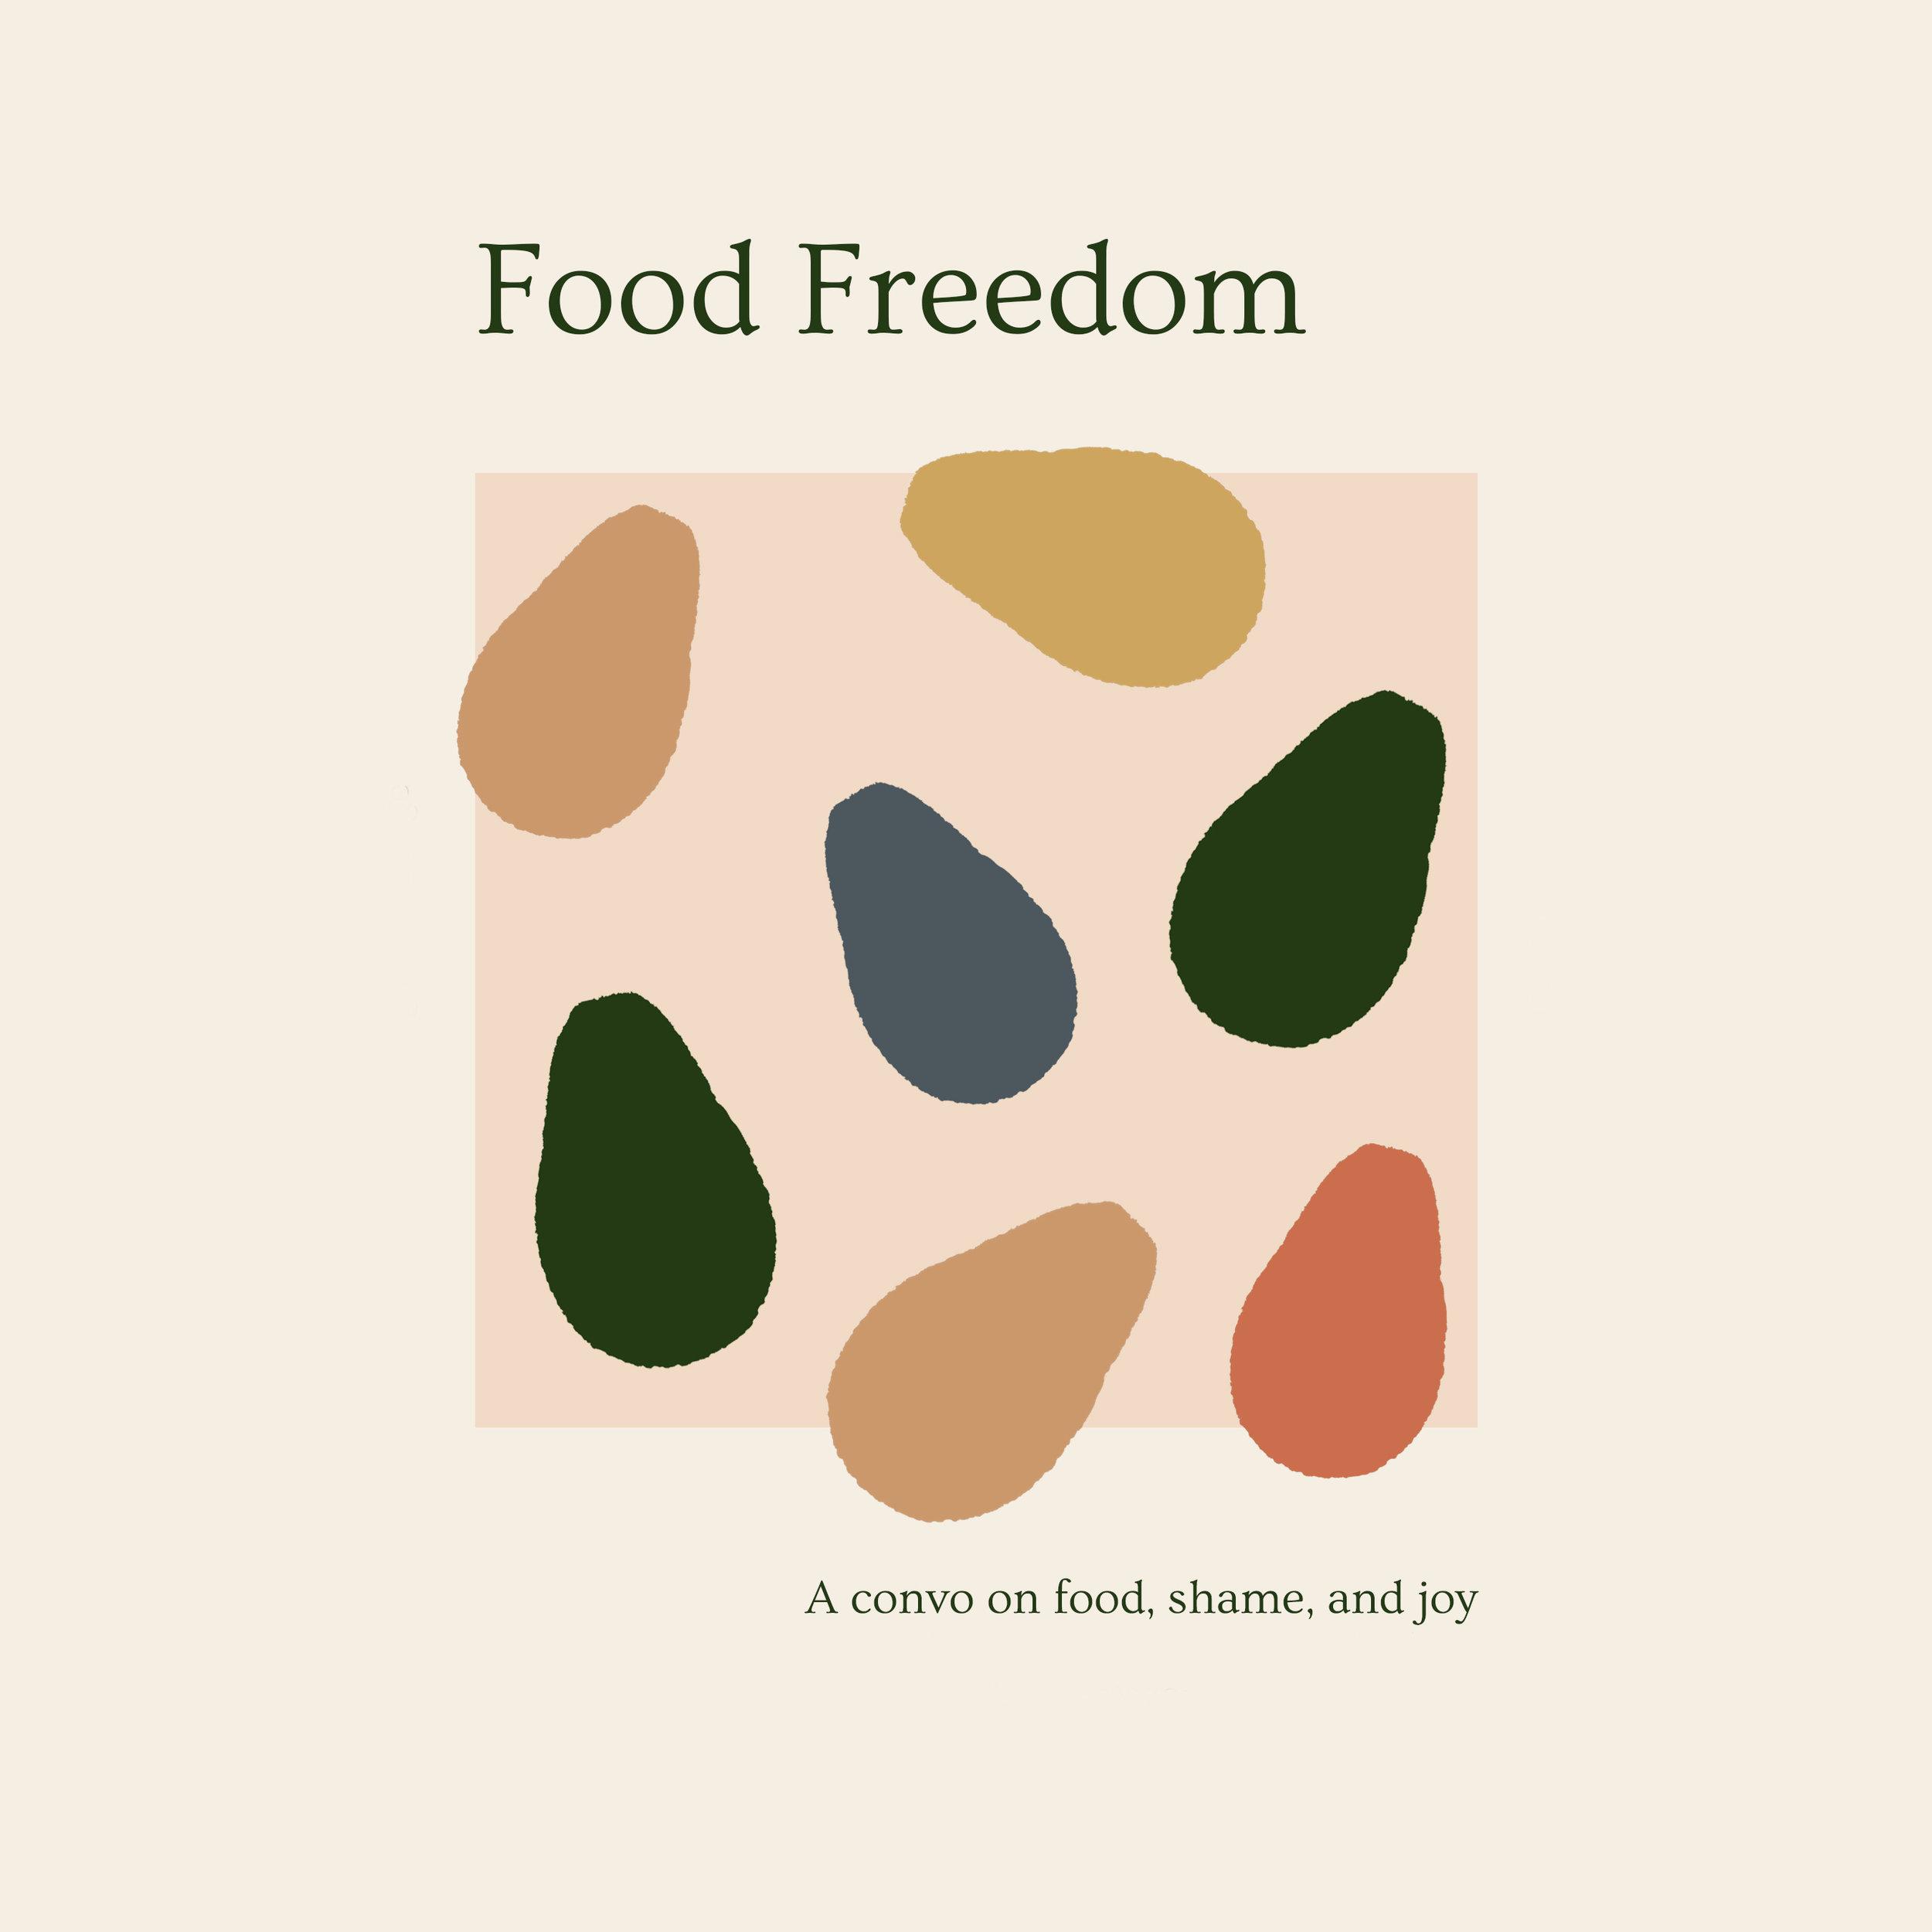 foodfreedom_radio.jpg